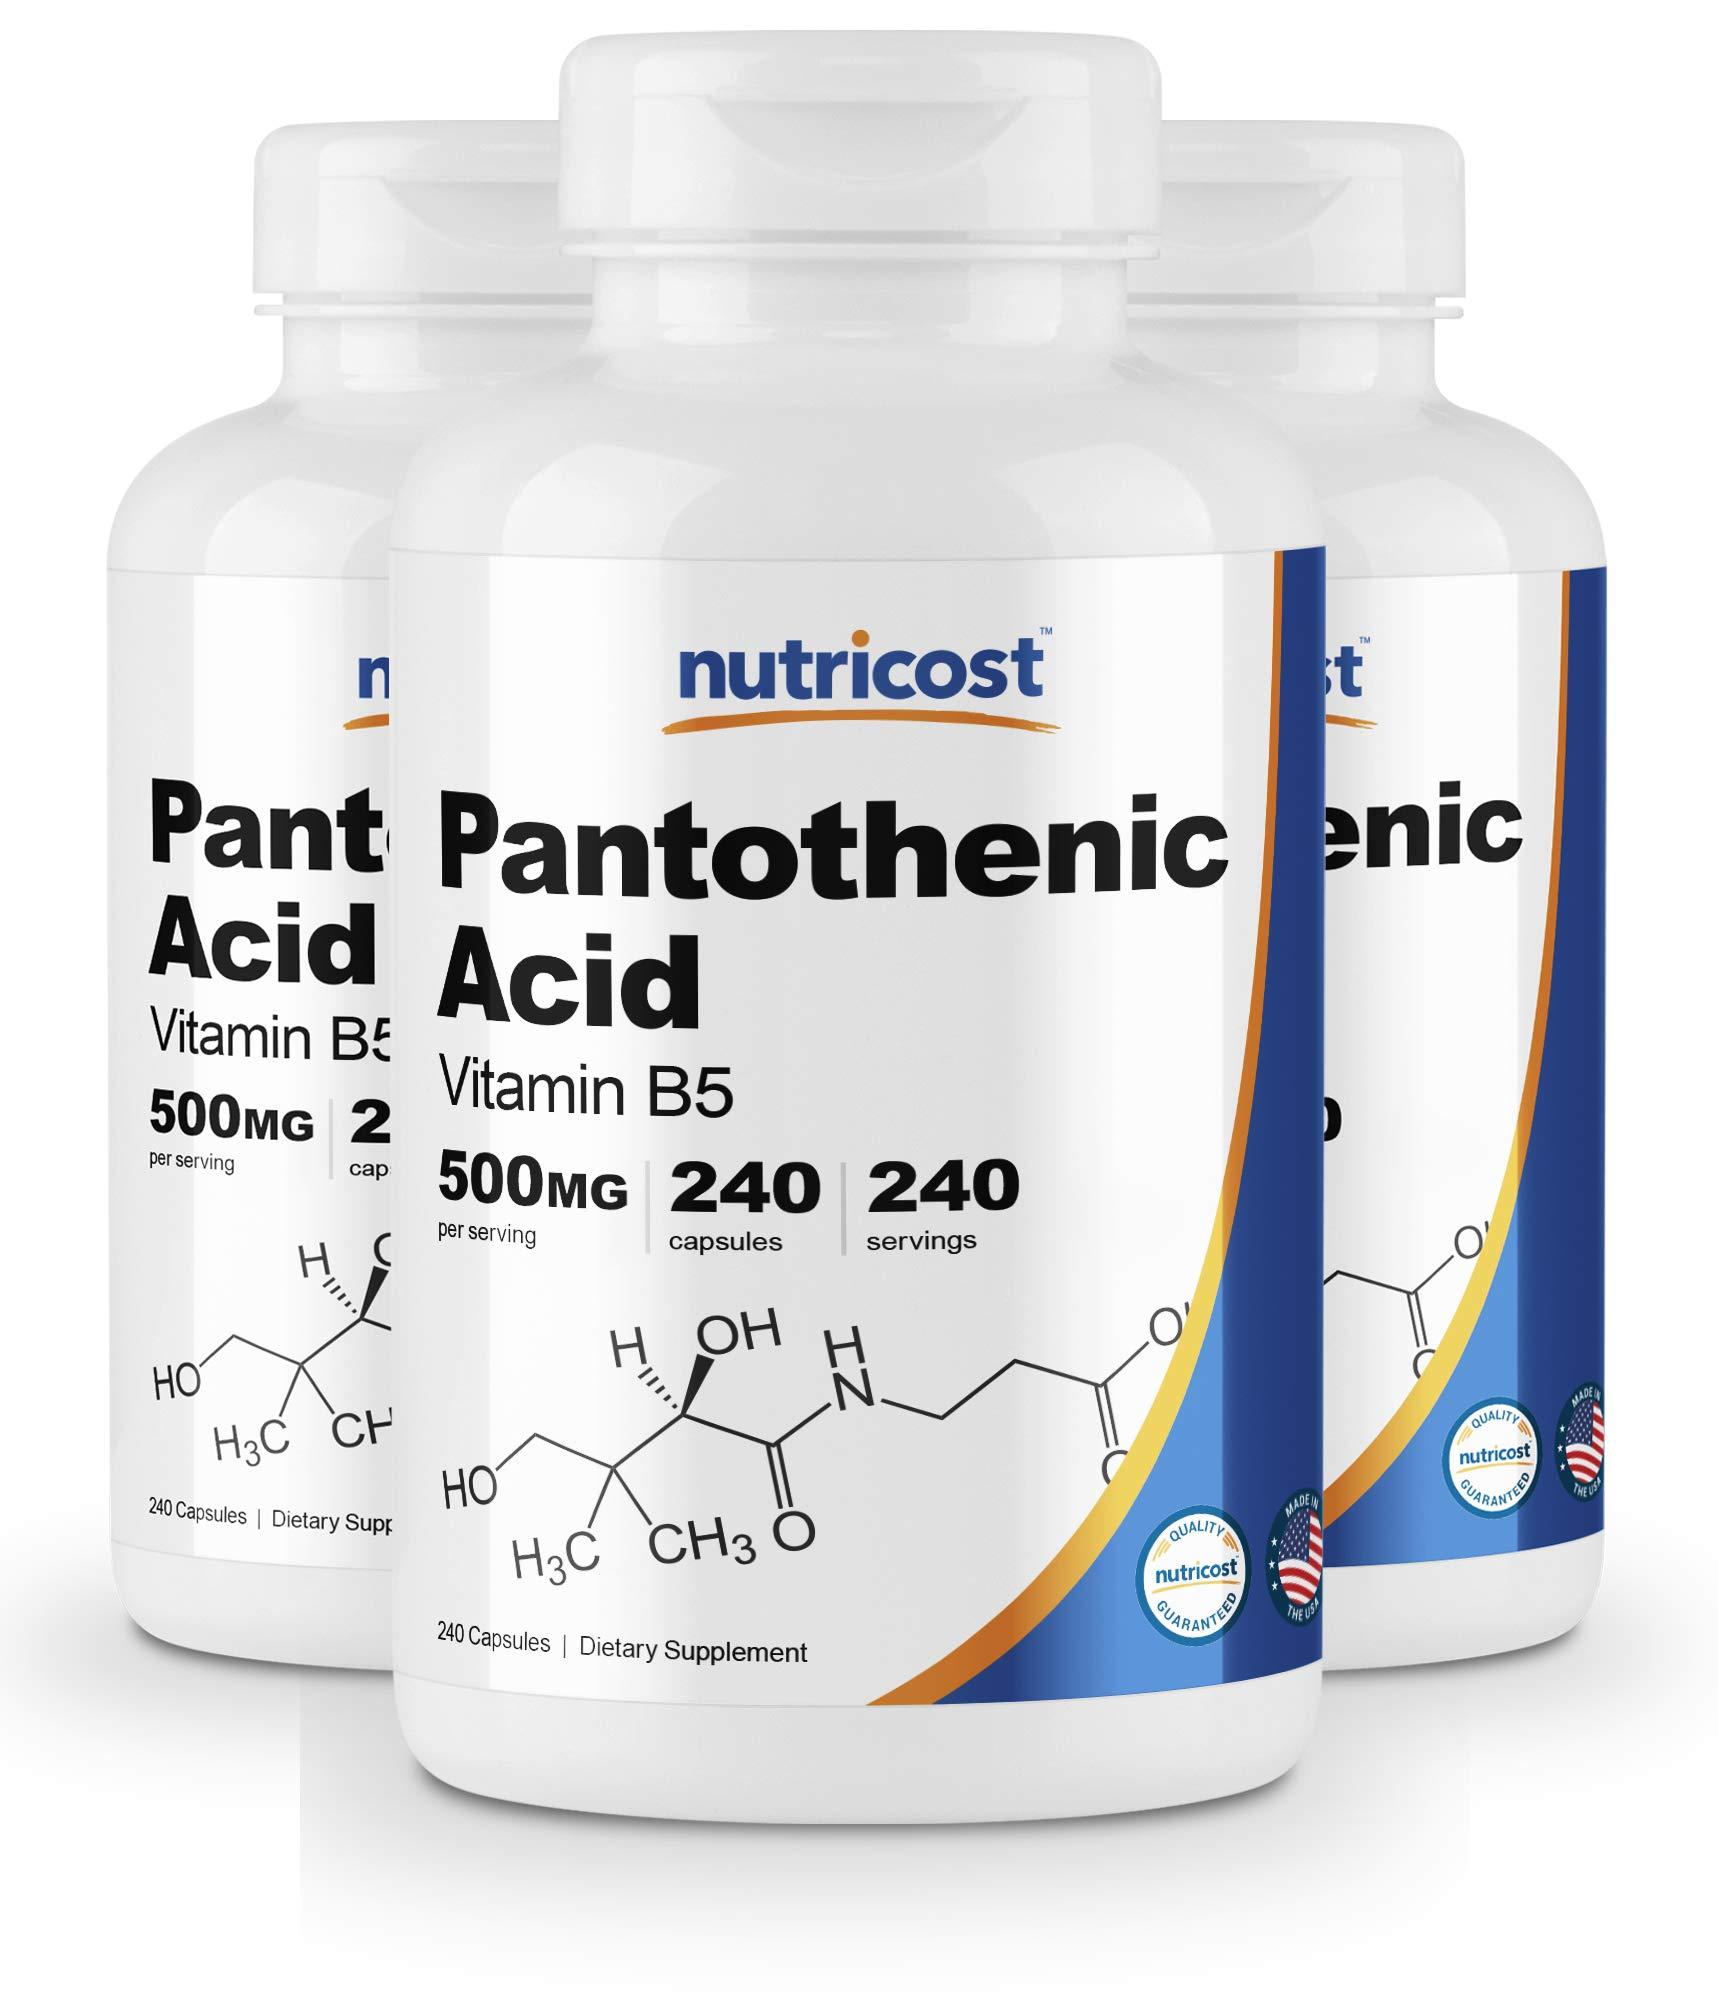 Nutricost Pantothenic Acid (Vitamin B5) 500mg, 240 Capsules (3 Bottles)